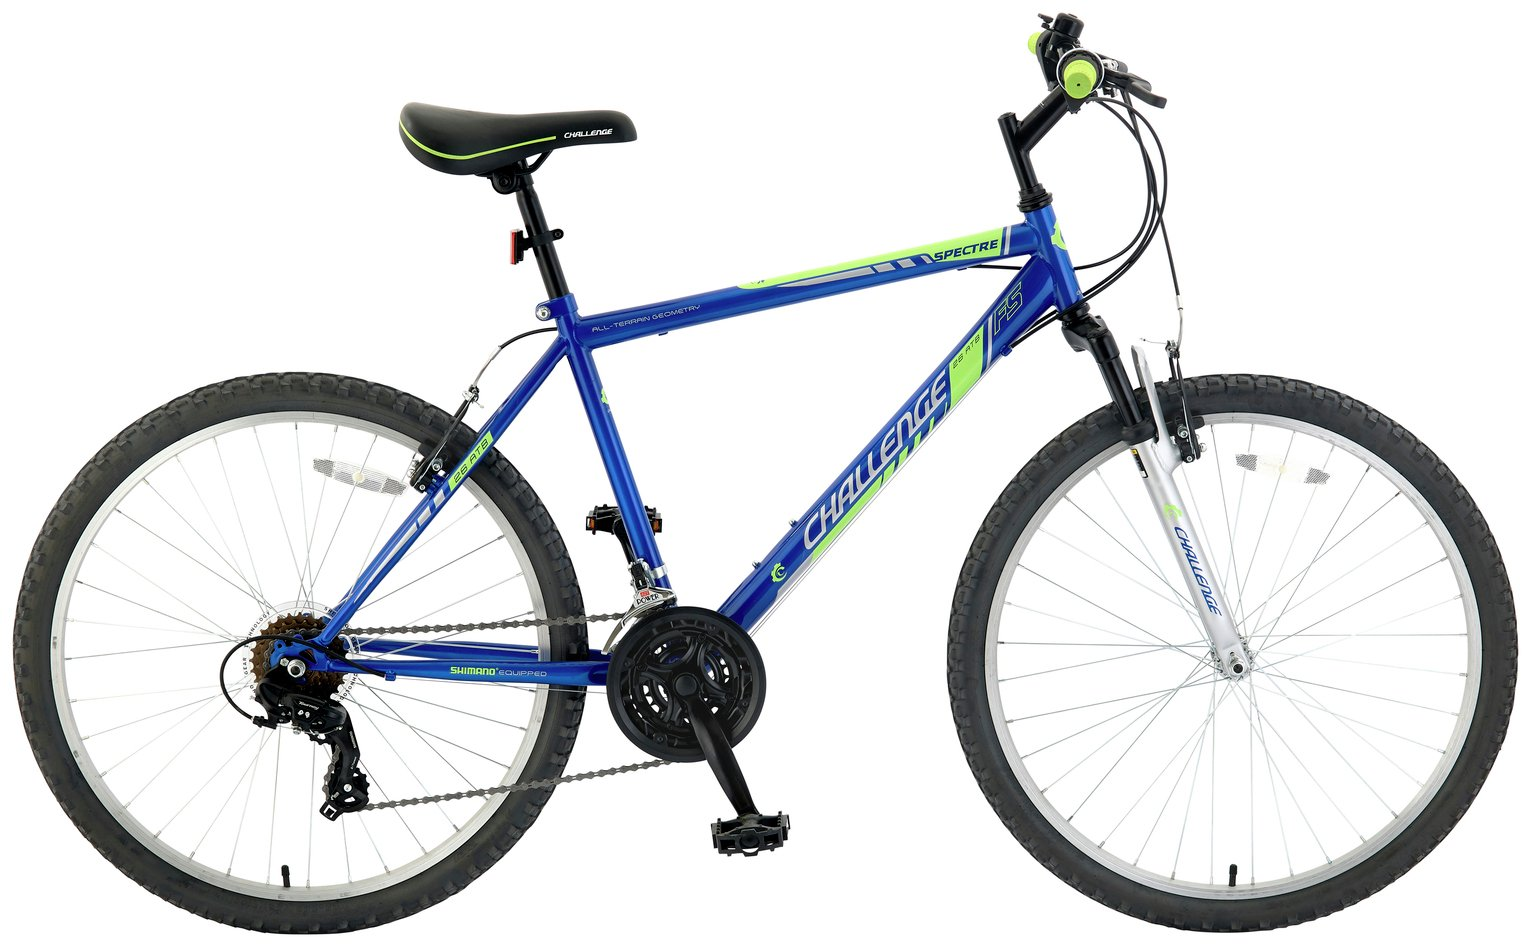 Challenge FS26SPE1N 26 inch Wheel Size Mens Mountain Bike review